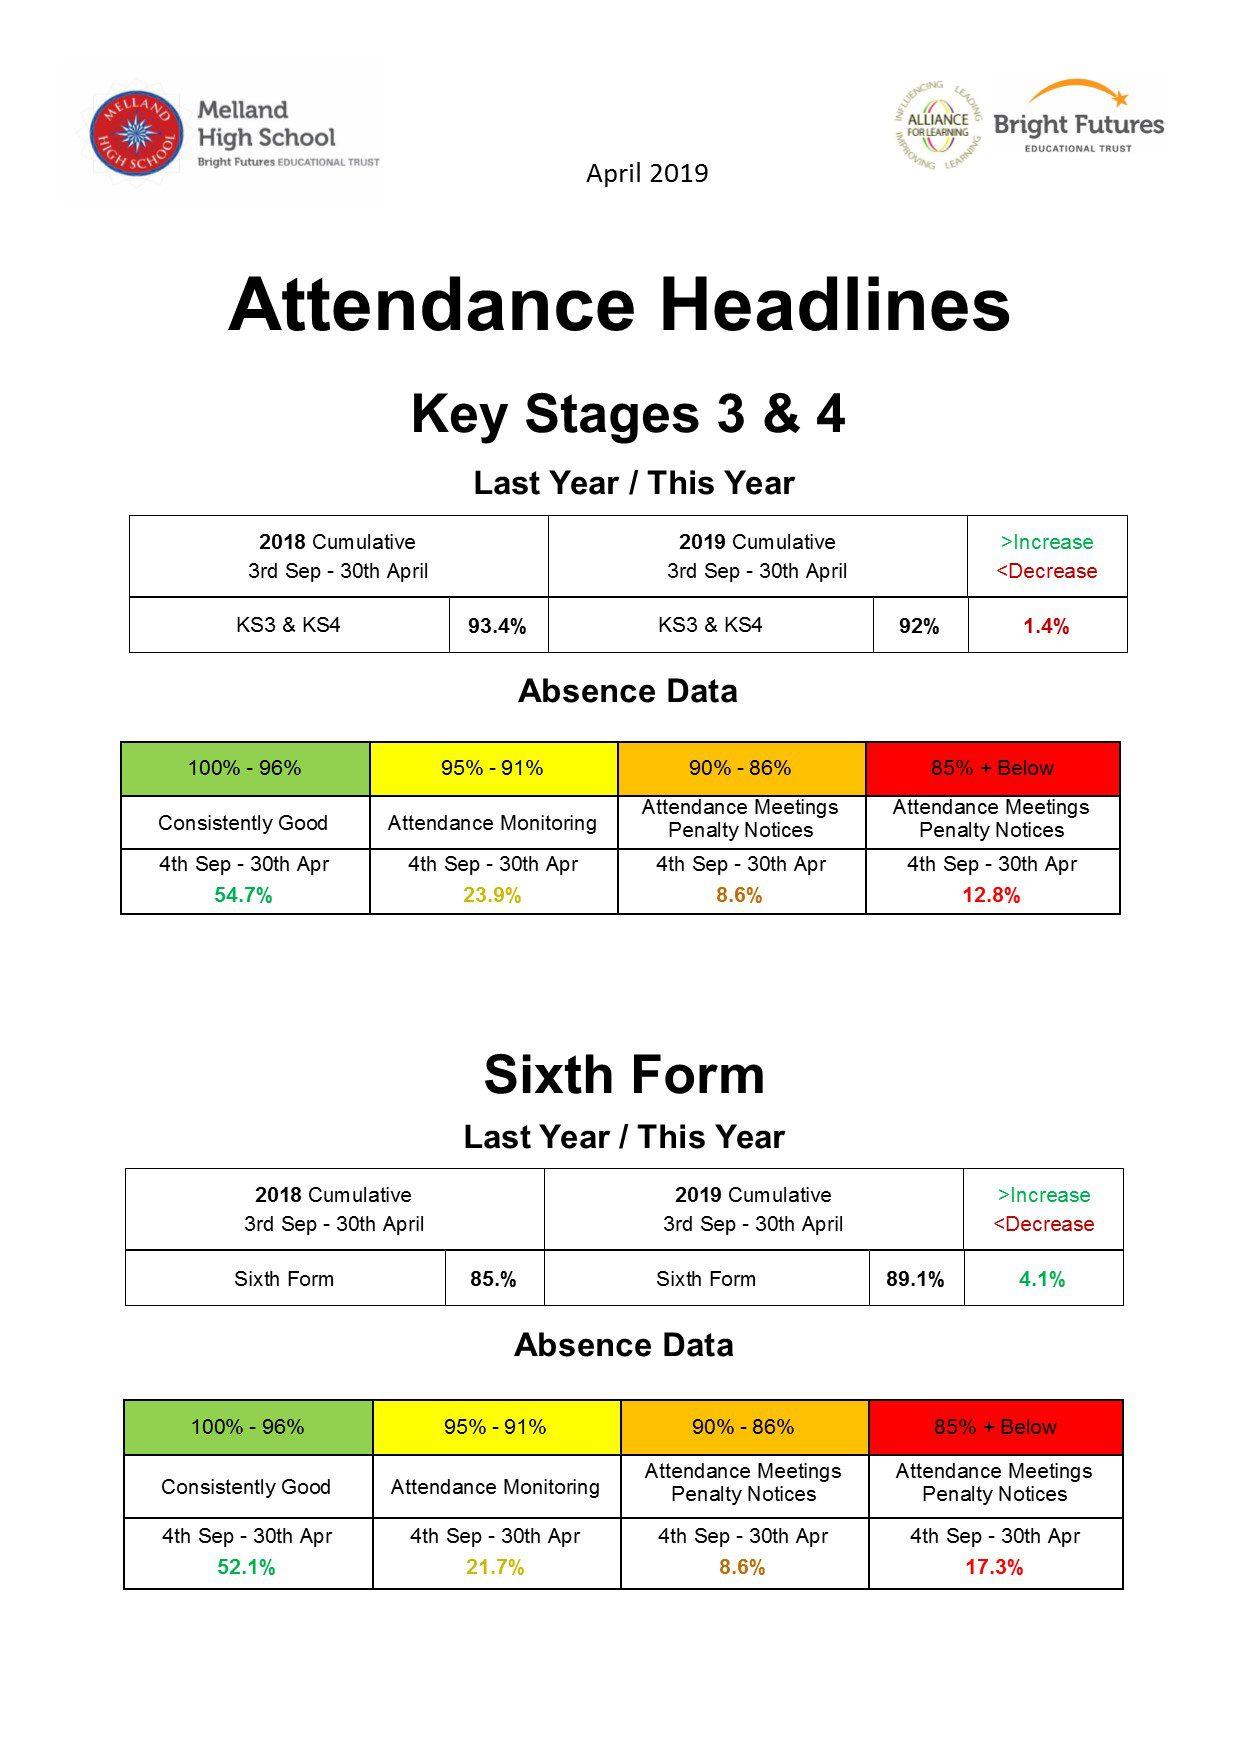 5. April attendance